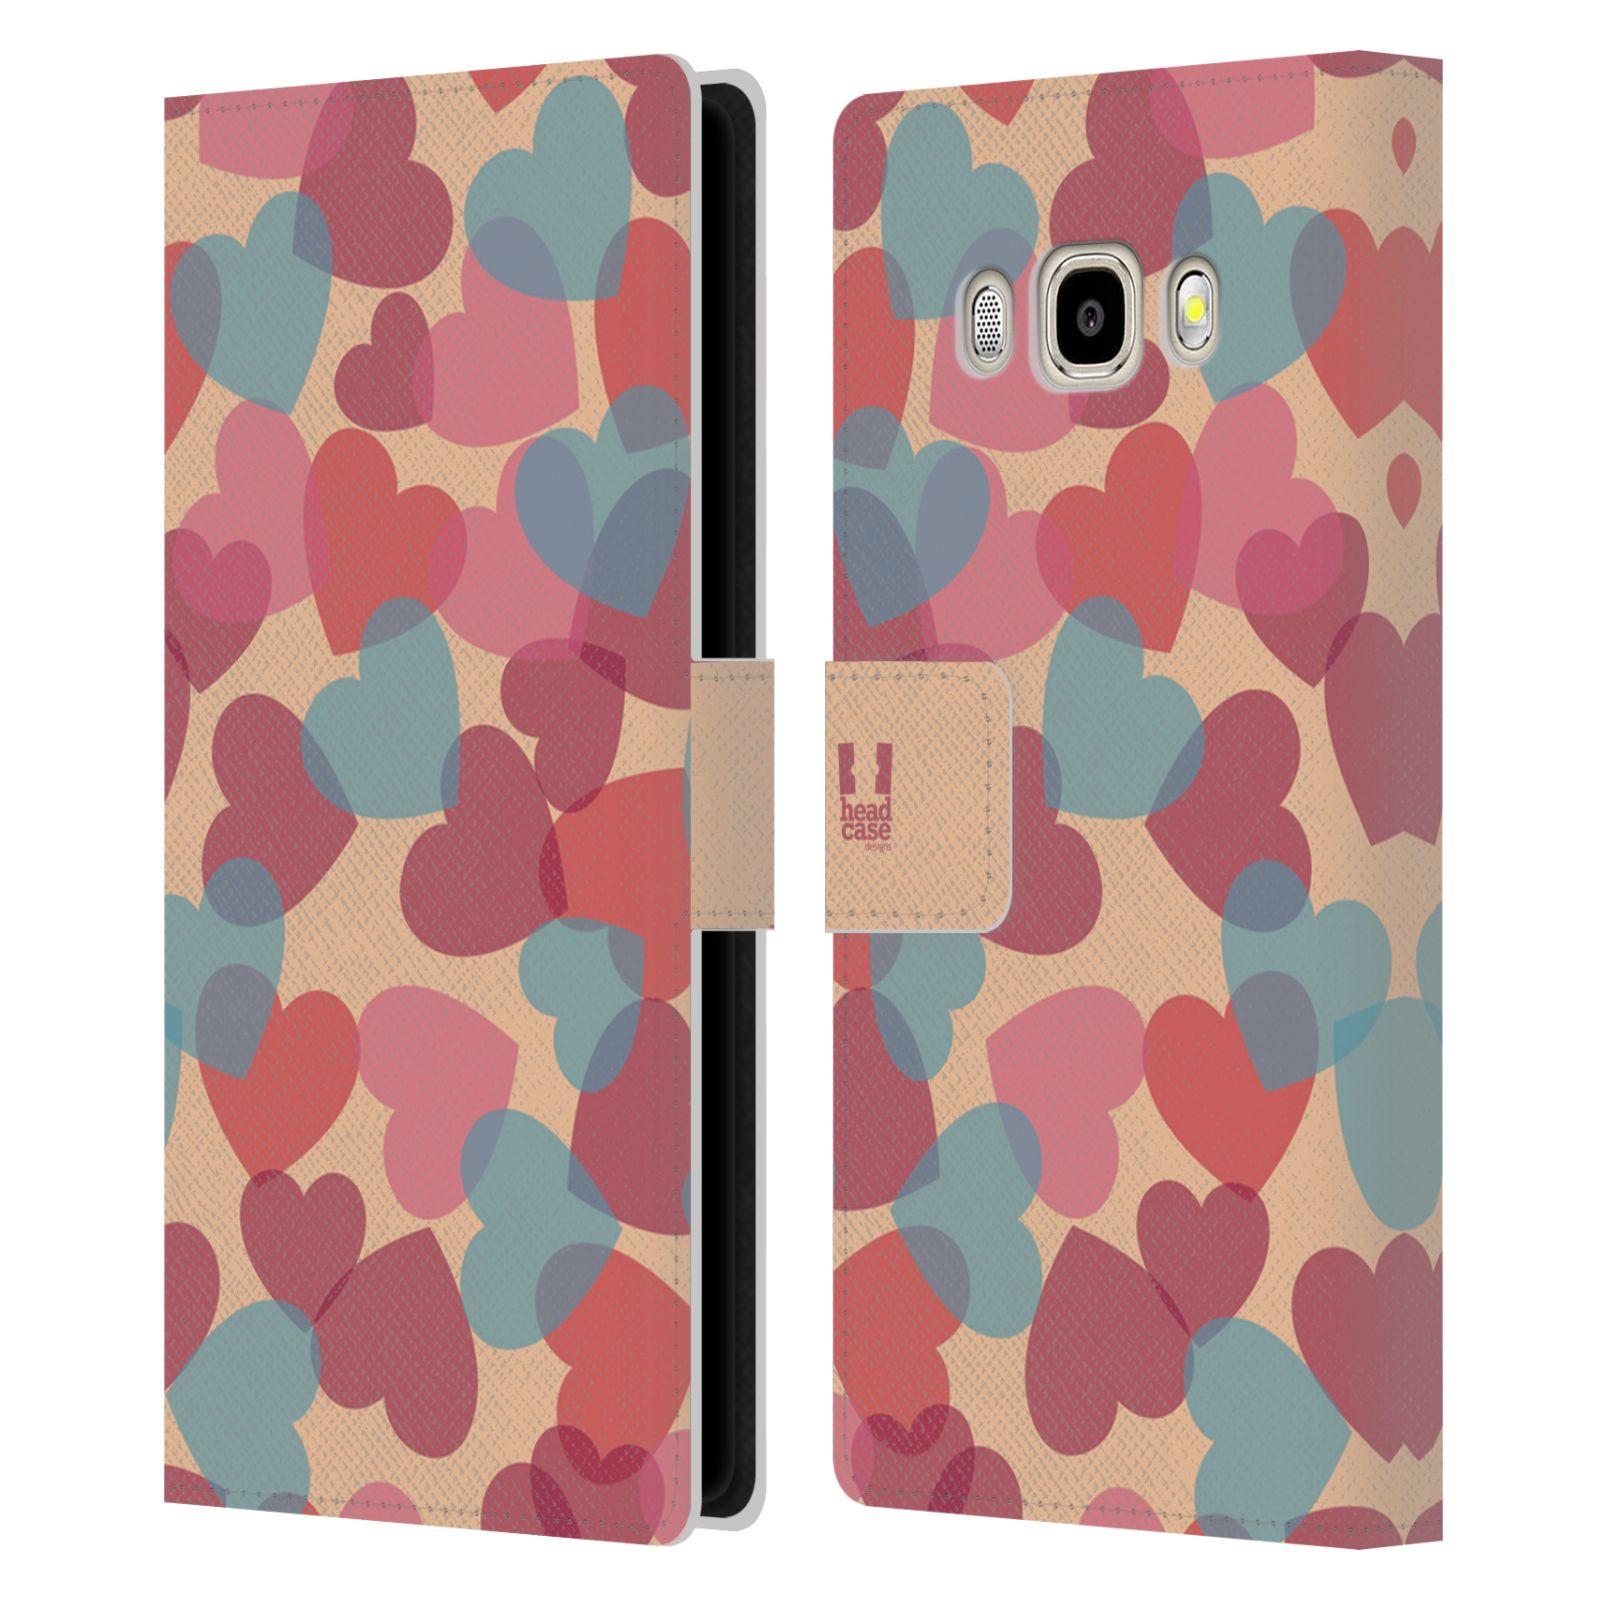 HEAD CASE Flipové pouzdro pro mobil Samsung Galaxy J5 2016 vzor prolínající se srdíčka, srdce, láska, růžová